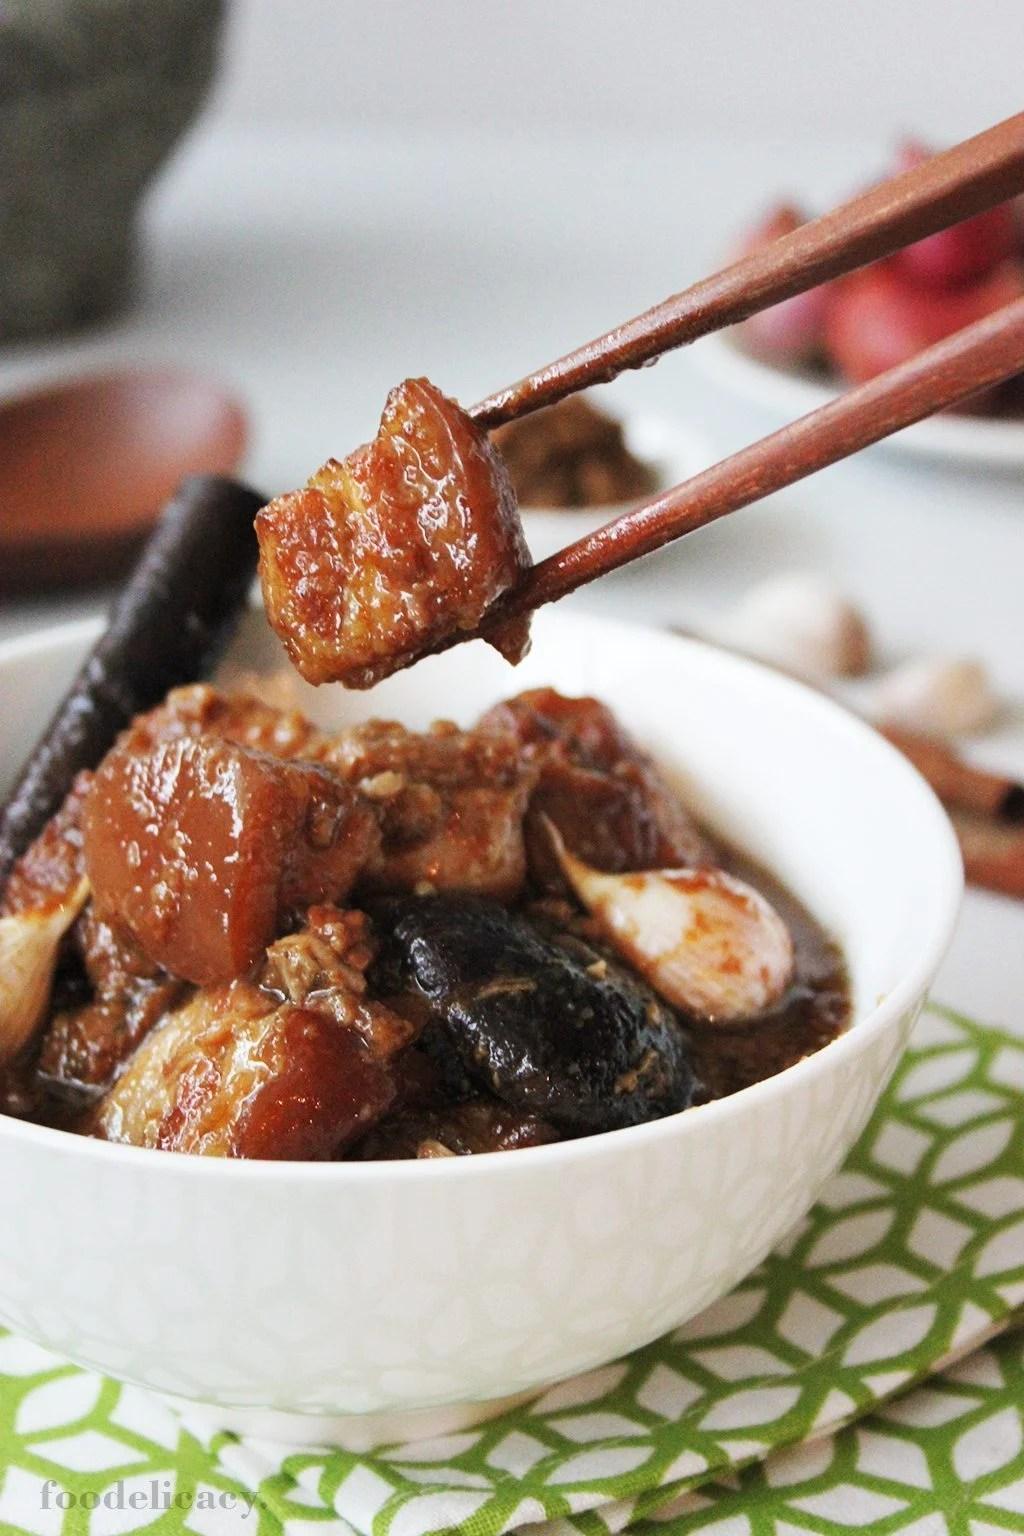 Braised Artinya : braised, artinya, Pongteh, (Nonya, Braised, Fermented, Sauce), Foodelicacy